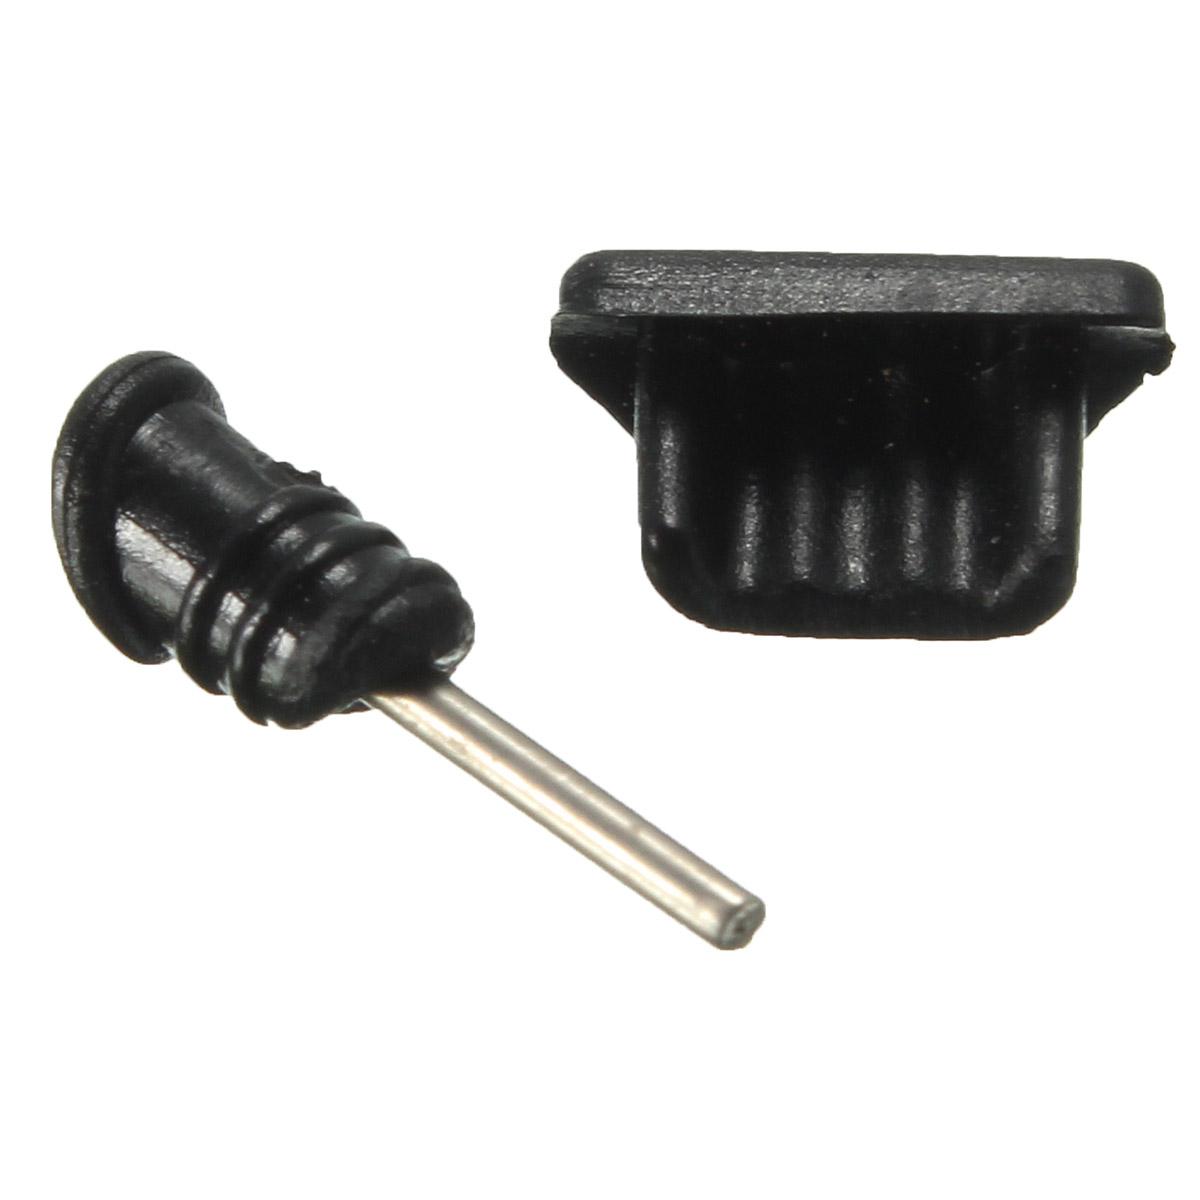 Universal Jack Nut : Mm earphone jack micro usb cell phone port plug cover